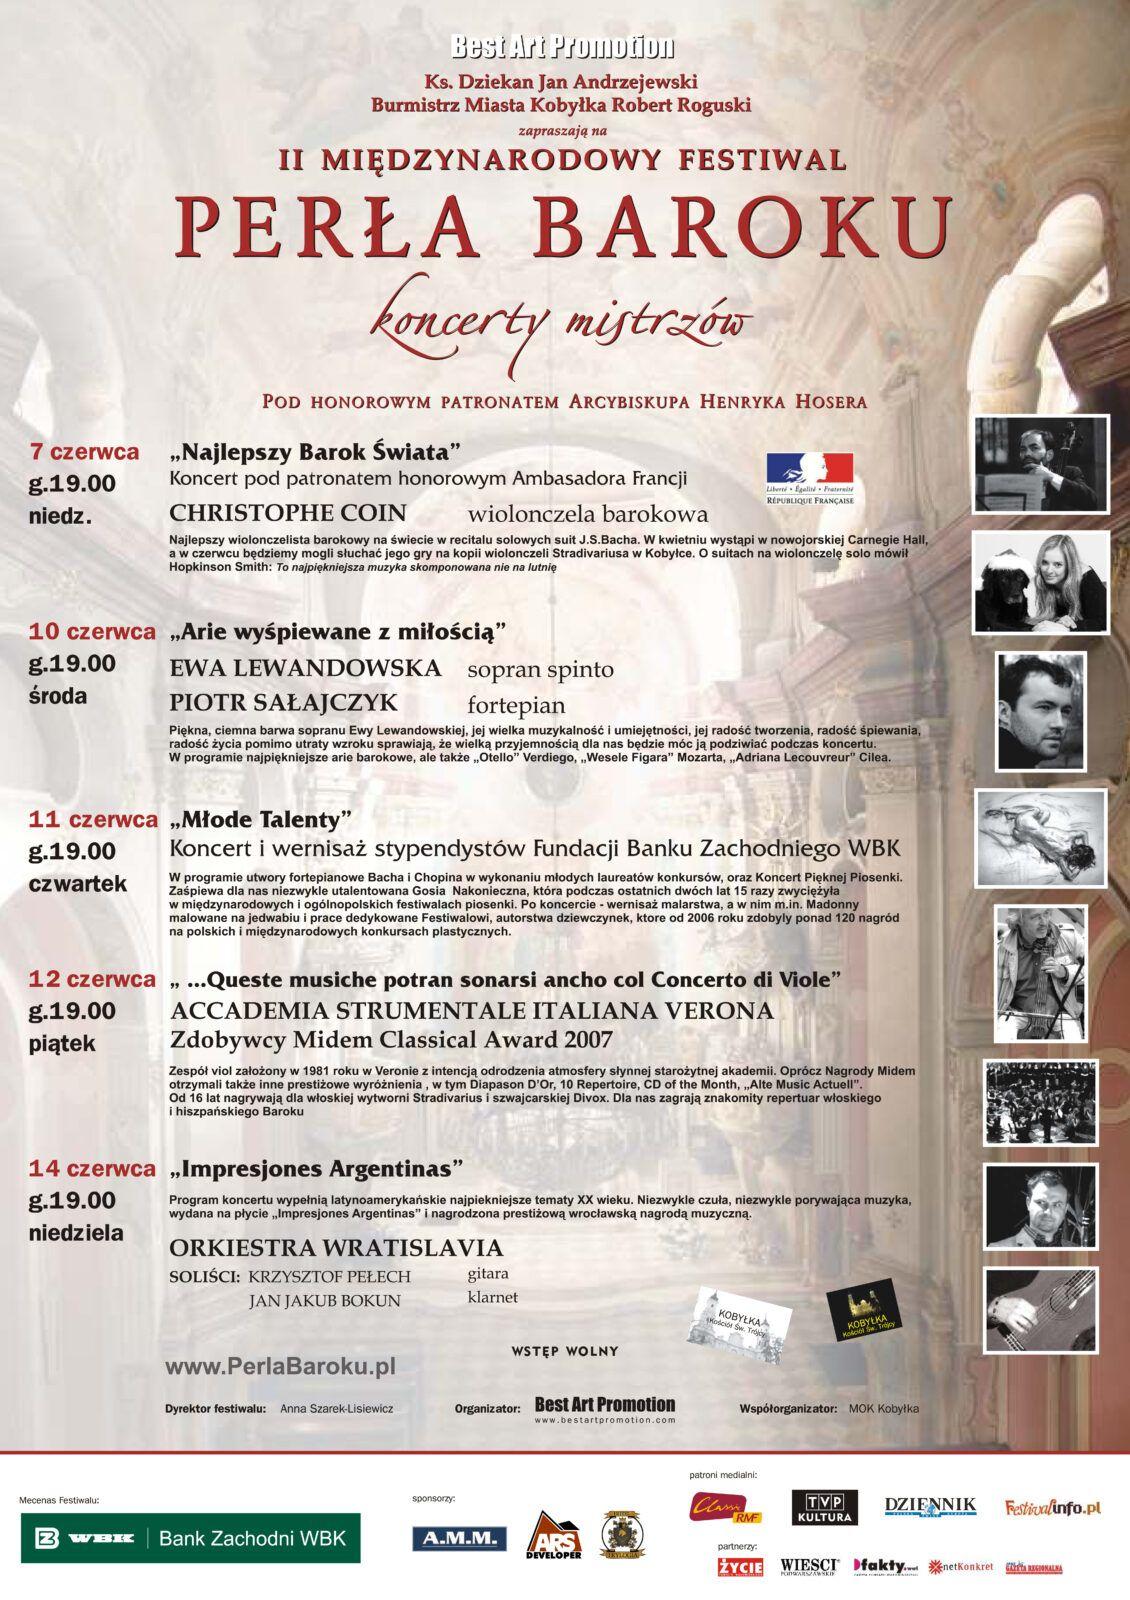 Festiwal-Perla-Baroku-2009-plakat